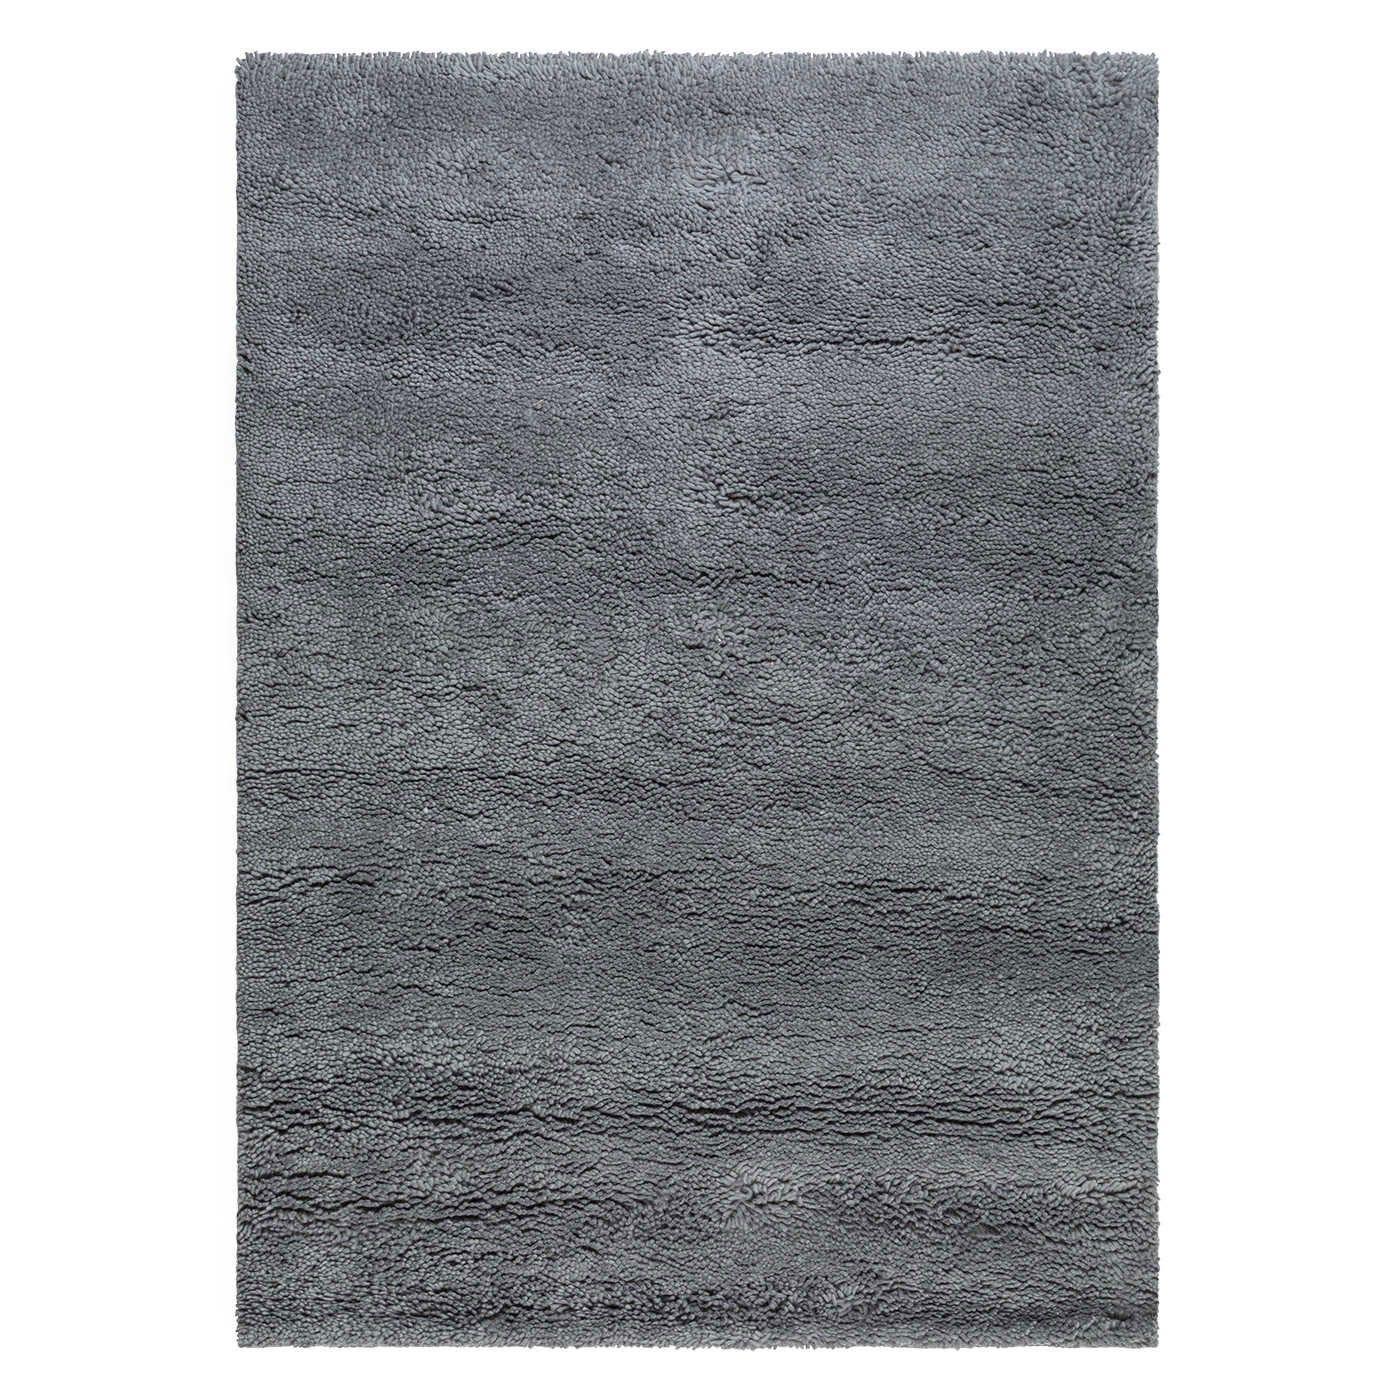 Jabara Rug Charcoal 120 x 180cm